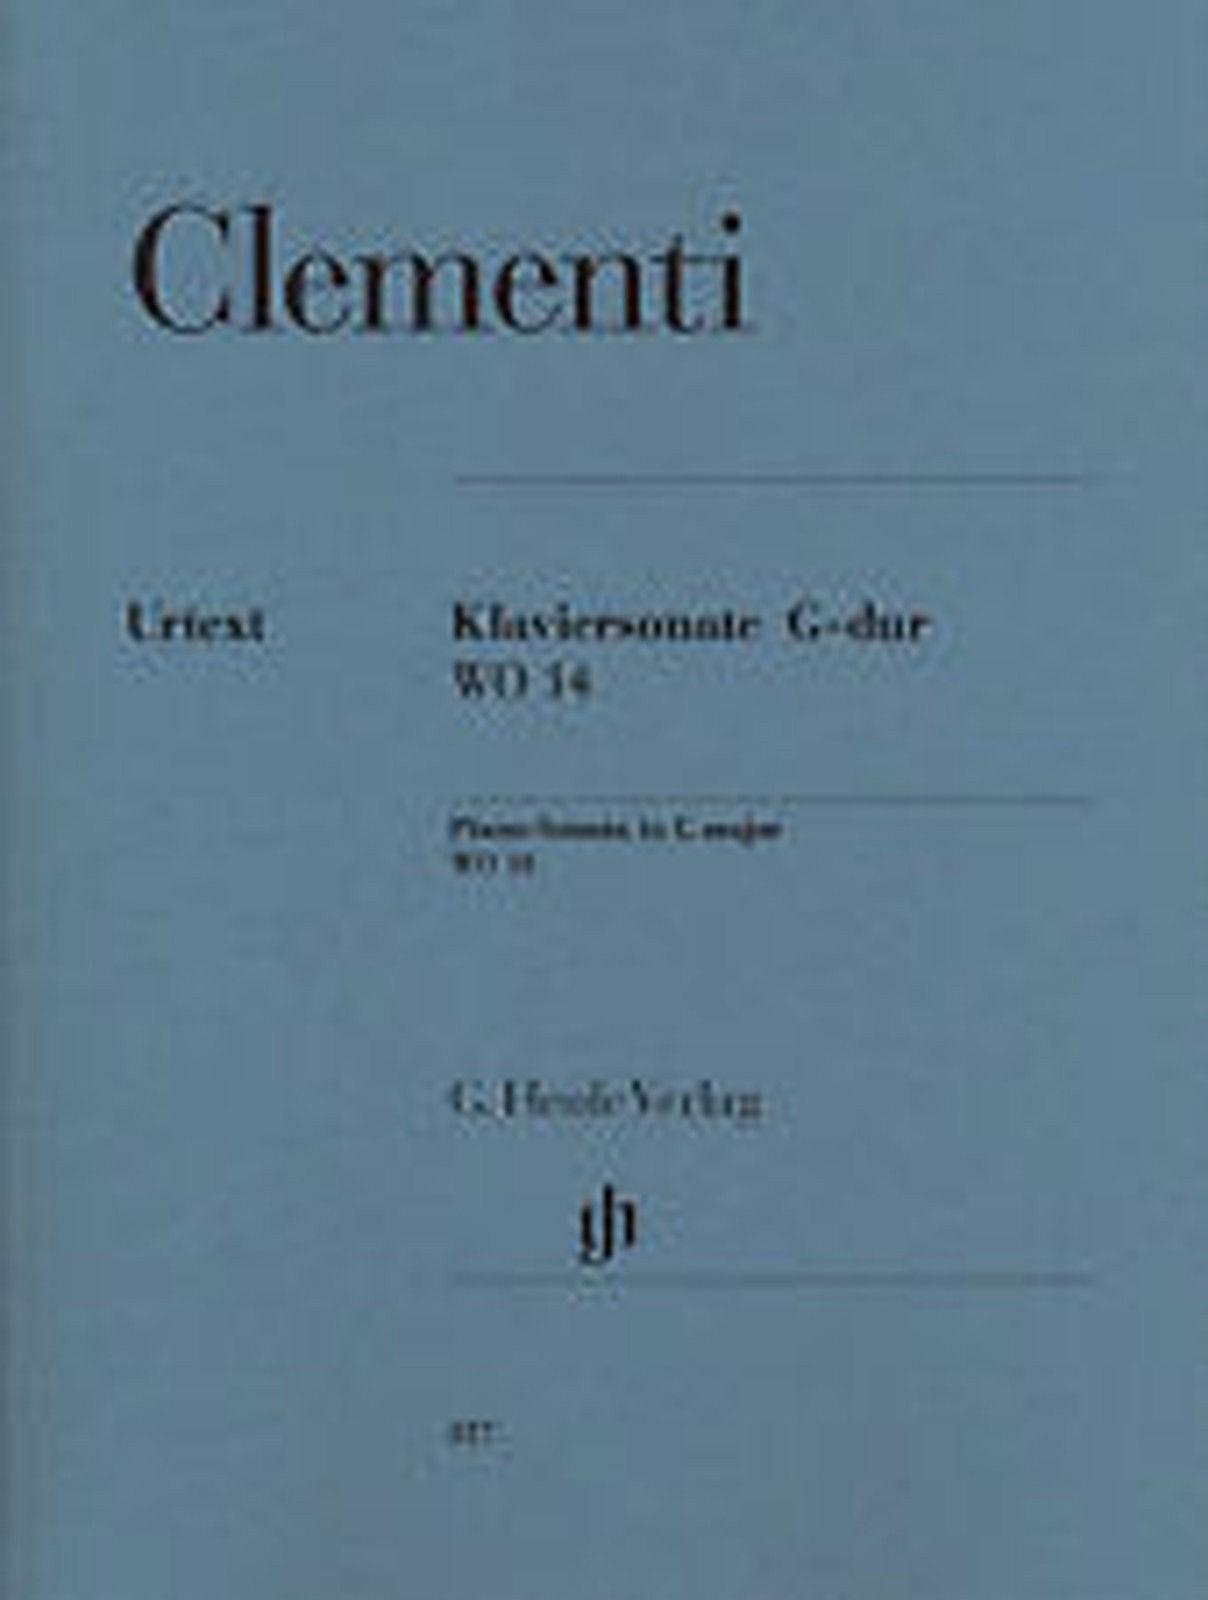 Clementi Piano Solo Sonata in G Major WO 14 Urtext Sheet Music Book B79 S102